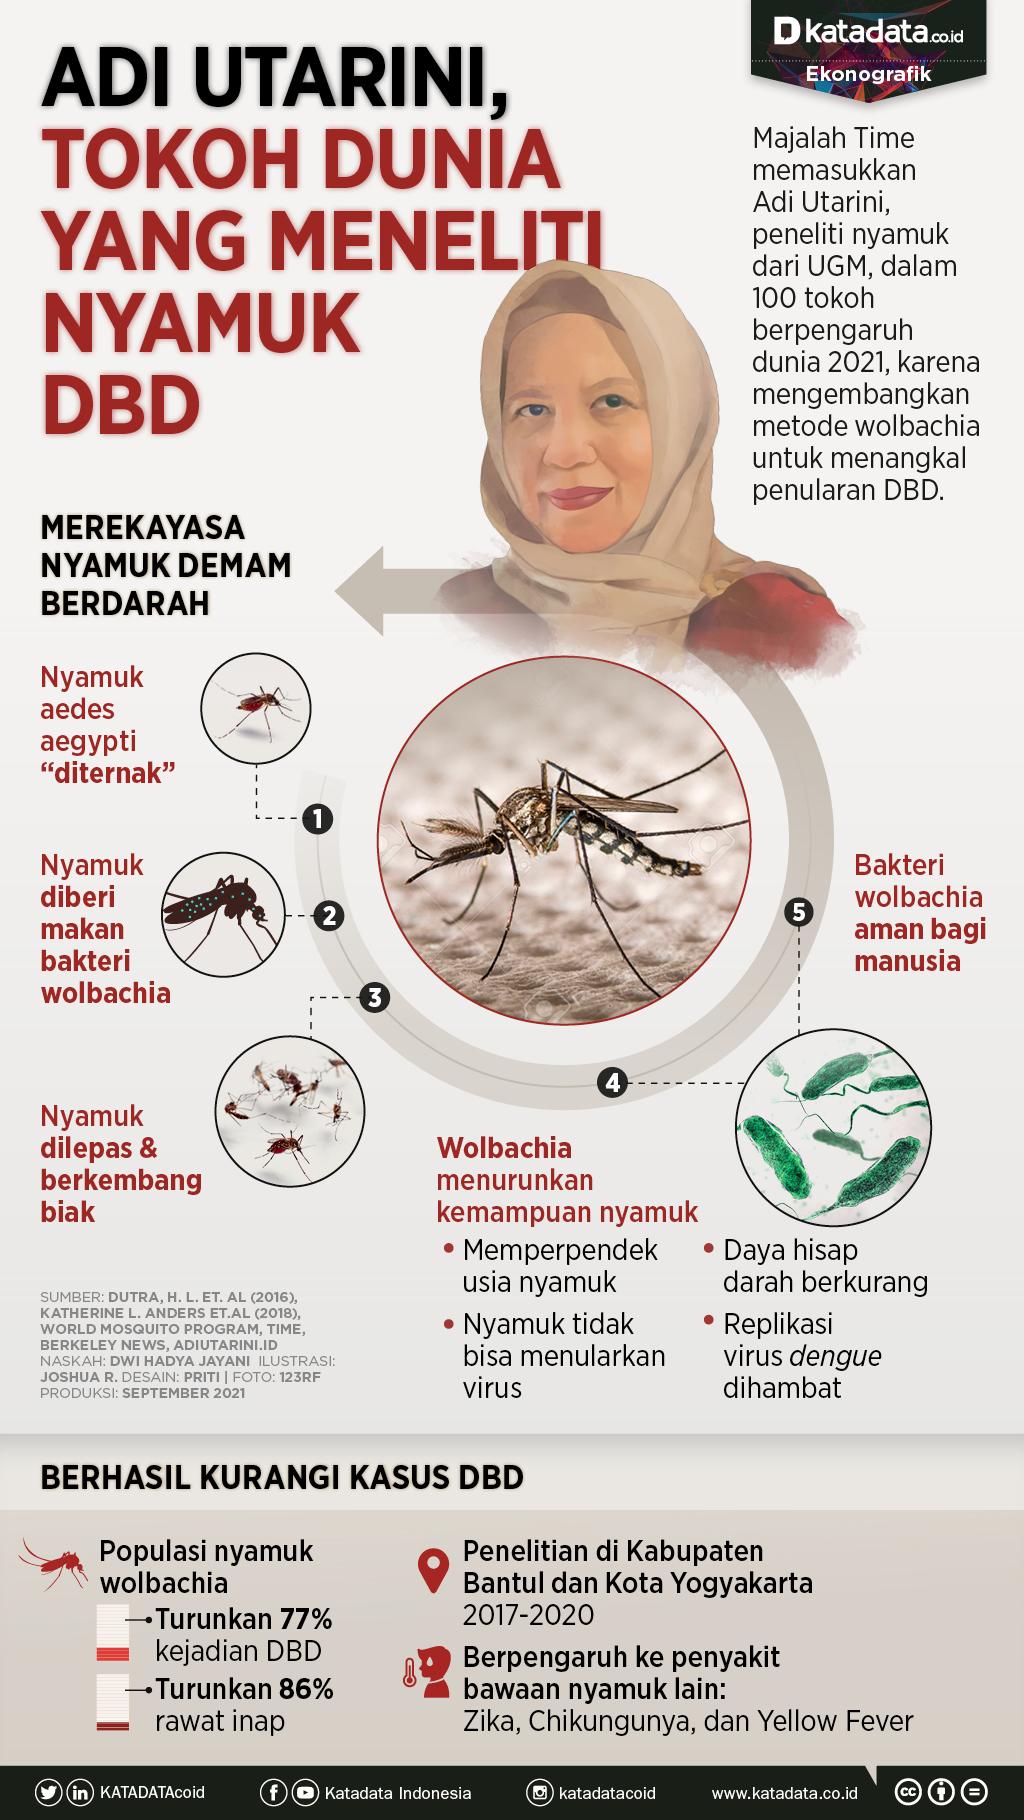 Infografik_Adi Utarini tokoh dunia yang meneliti nyamuk dbd